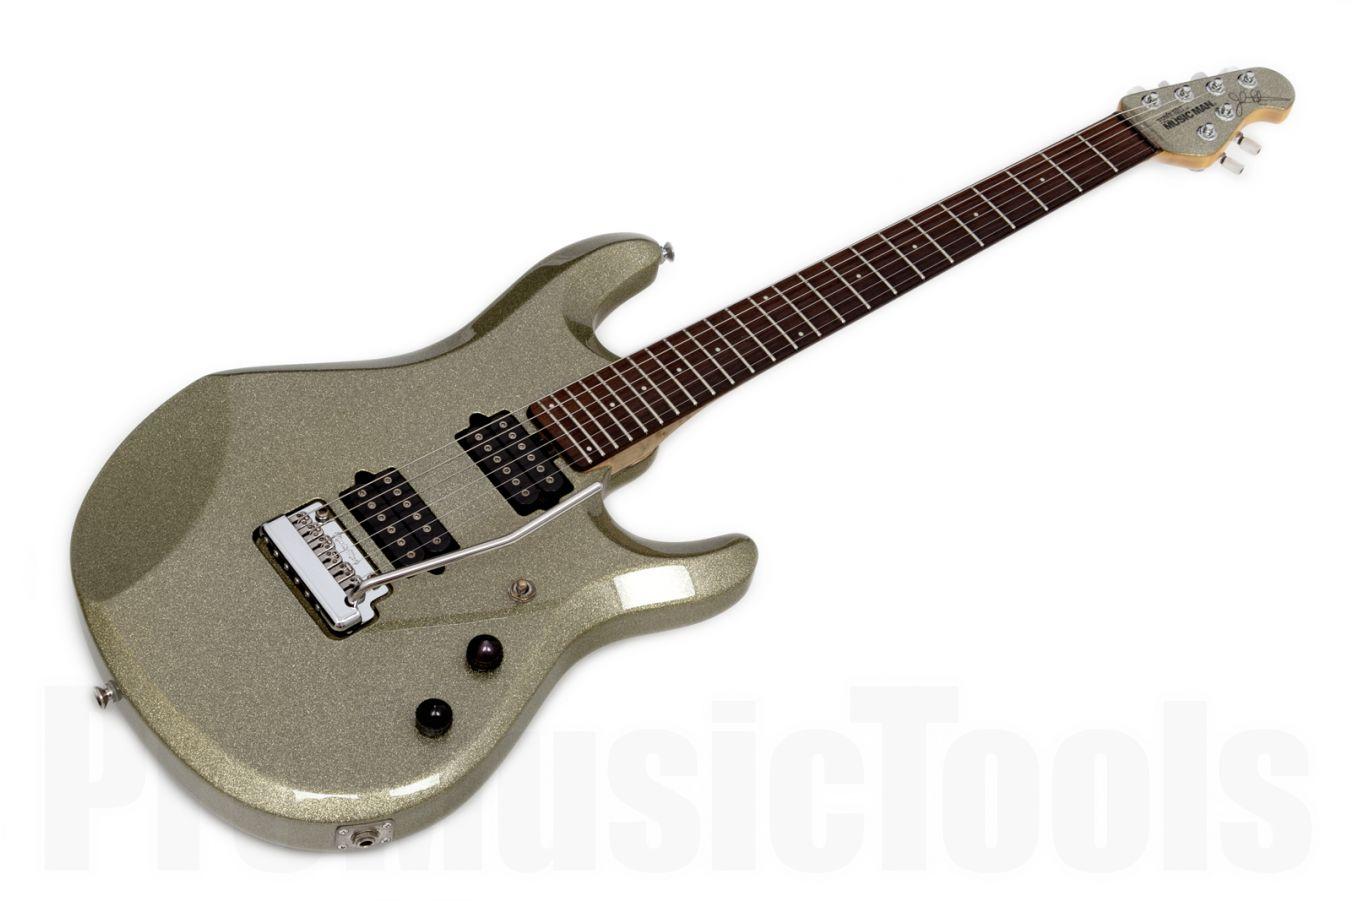 Music Man USA John Petrucci JP6 GGS - Gremlin Green Sparkle MH